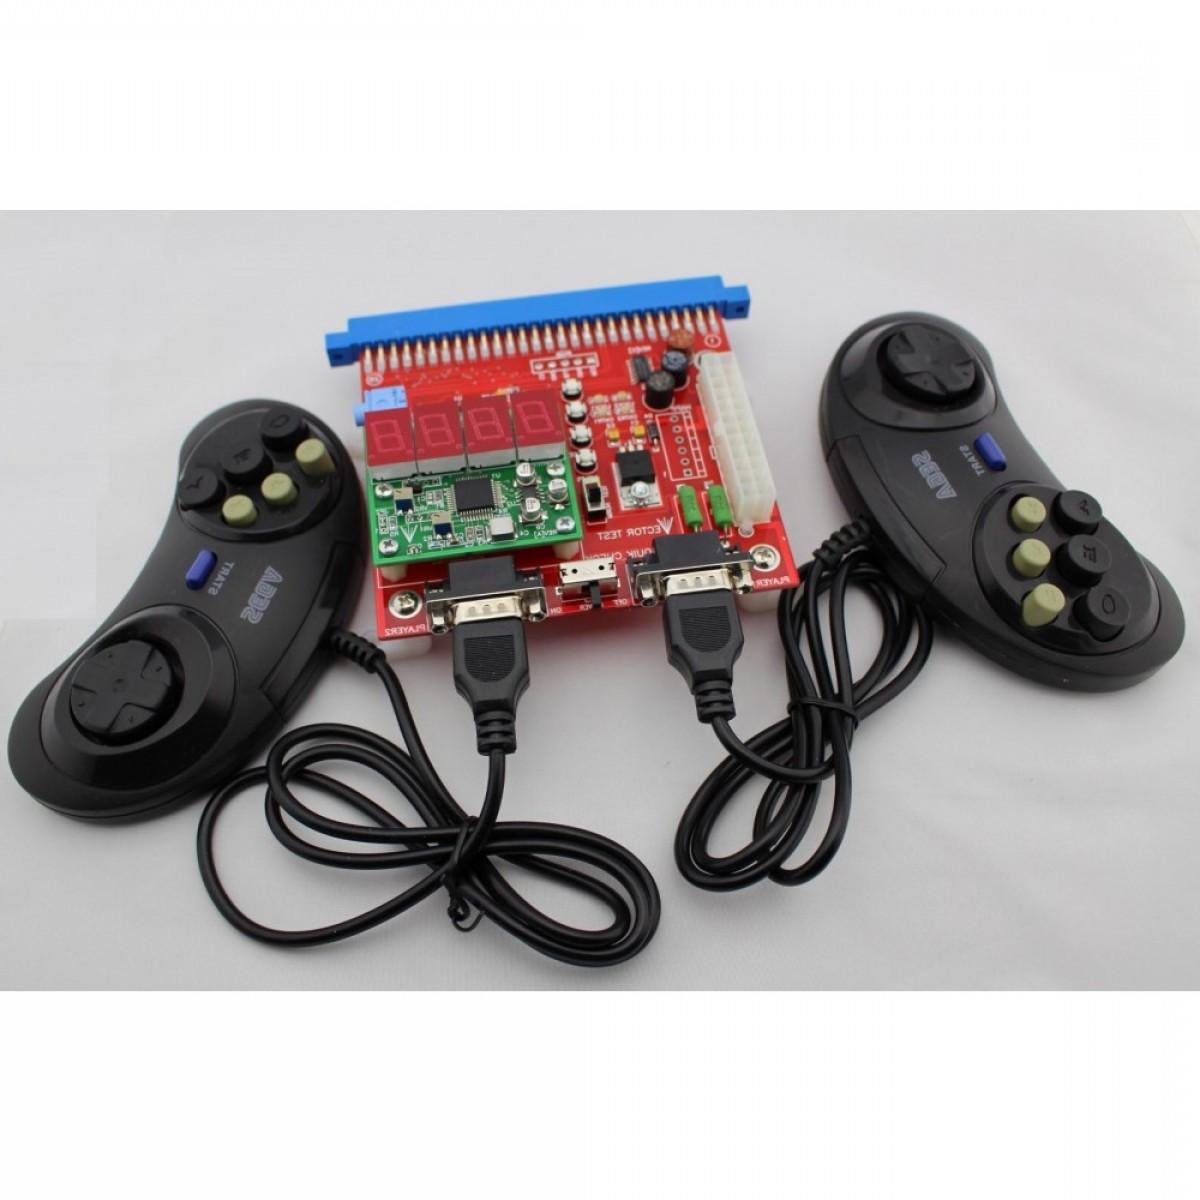 1200x1200 Vector Labs Jamma Pcb Quick Test Geekchicpro